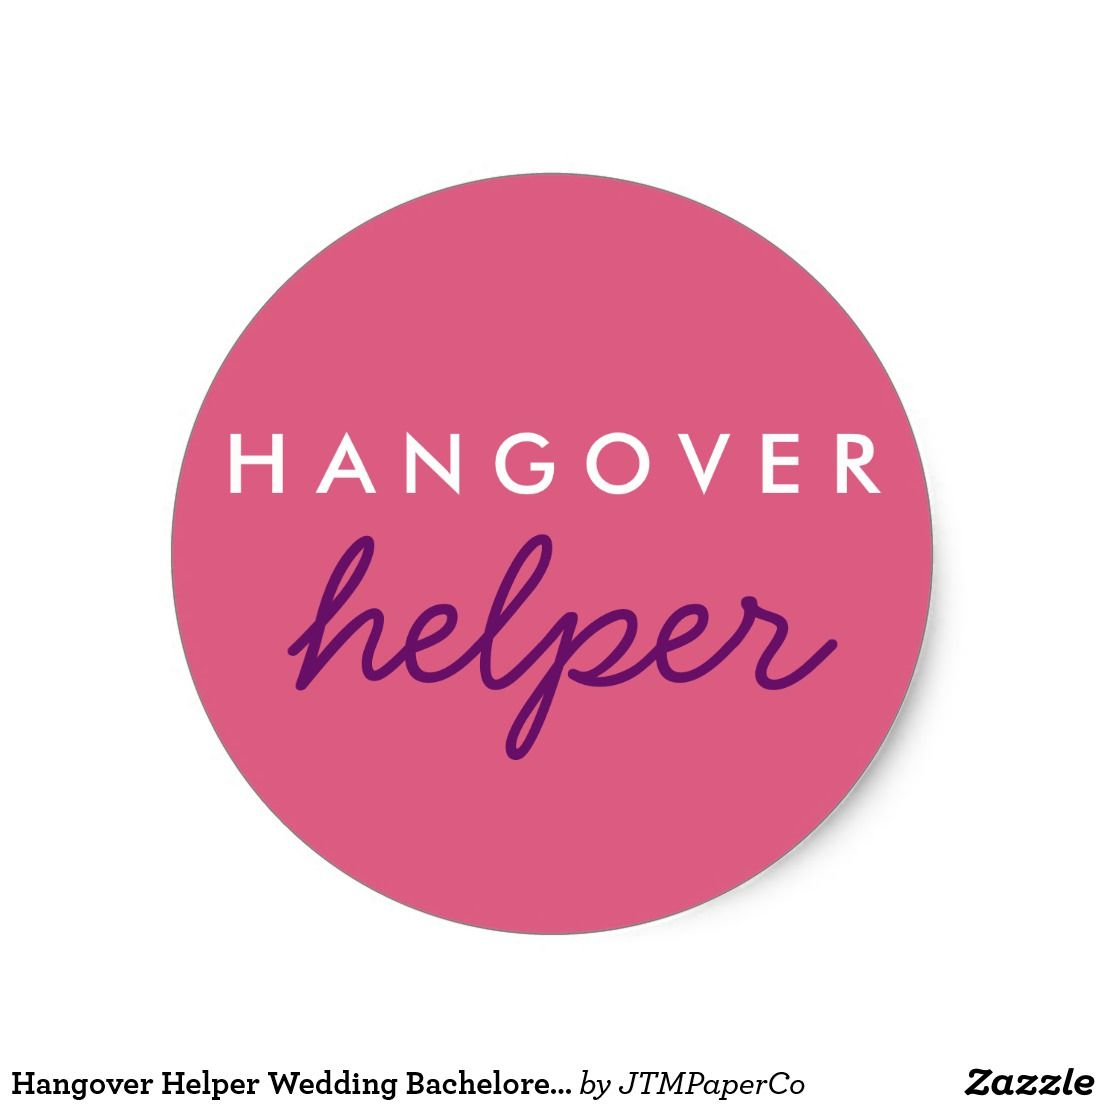 Hangover Helper Wedding Bachelorette Favor Sticker in Blush pink and ...